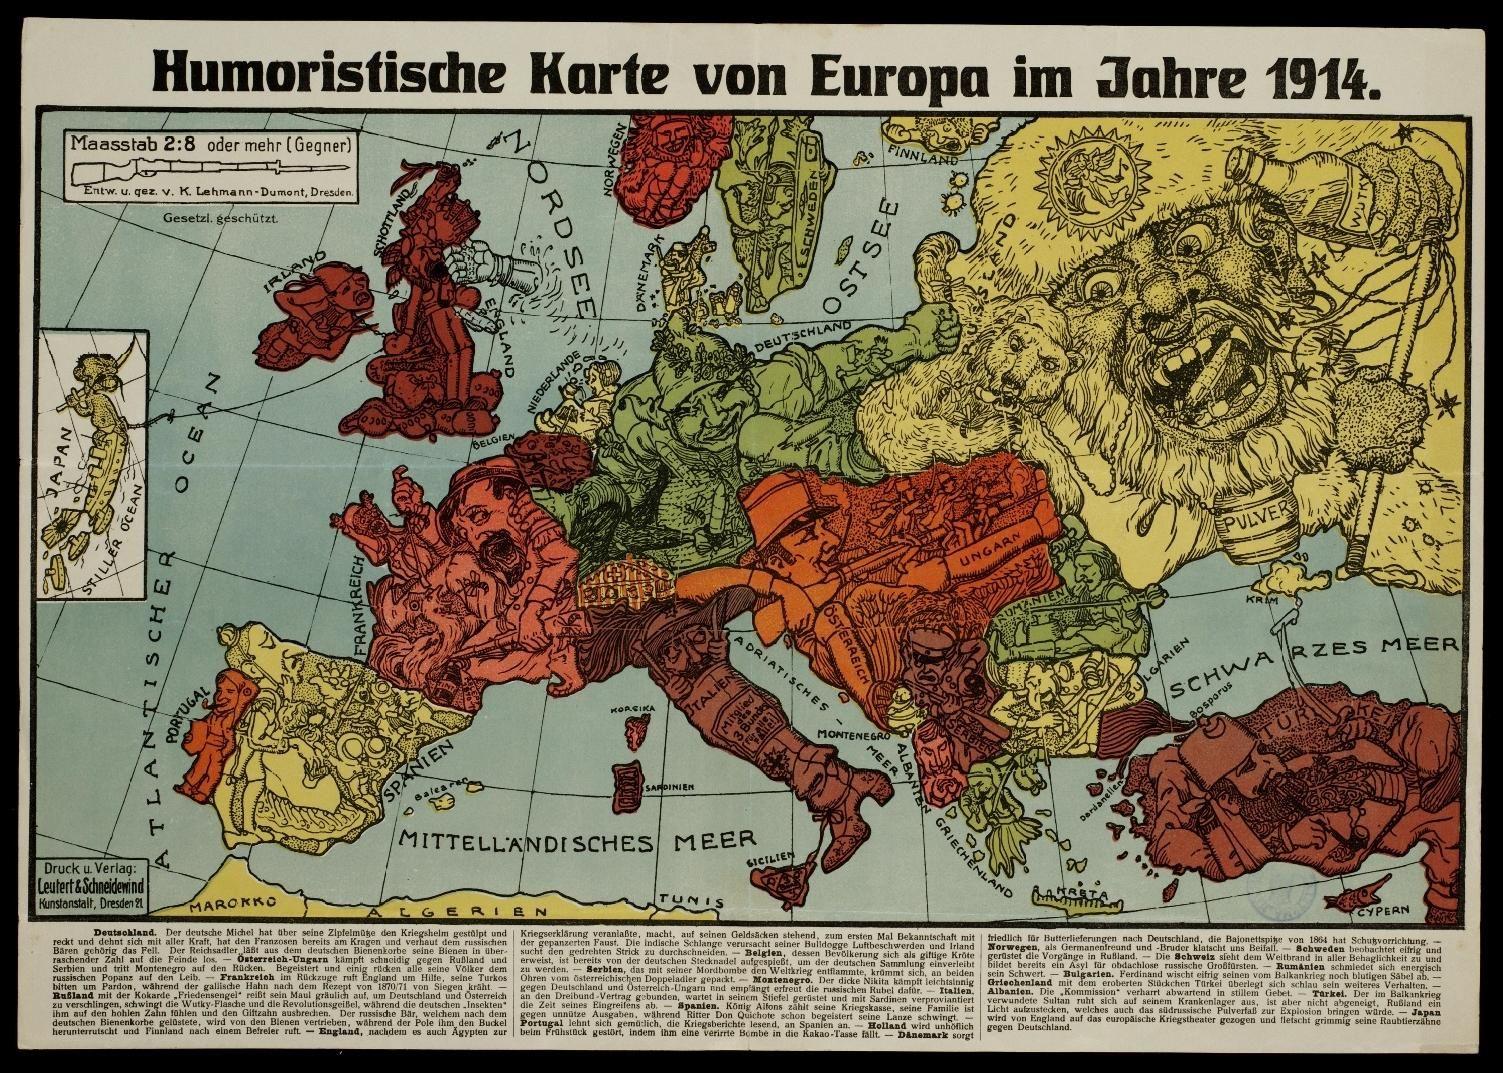 Des Cartes Satiriques A Travers L Histoire Map Cartography